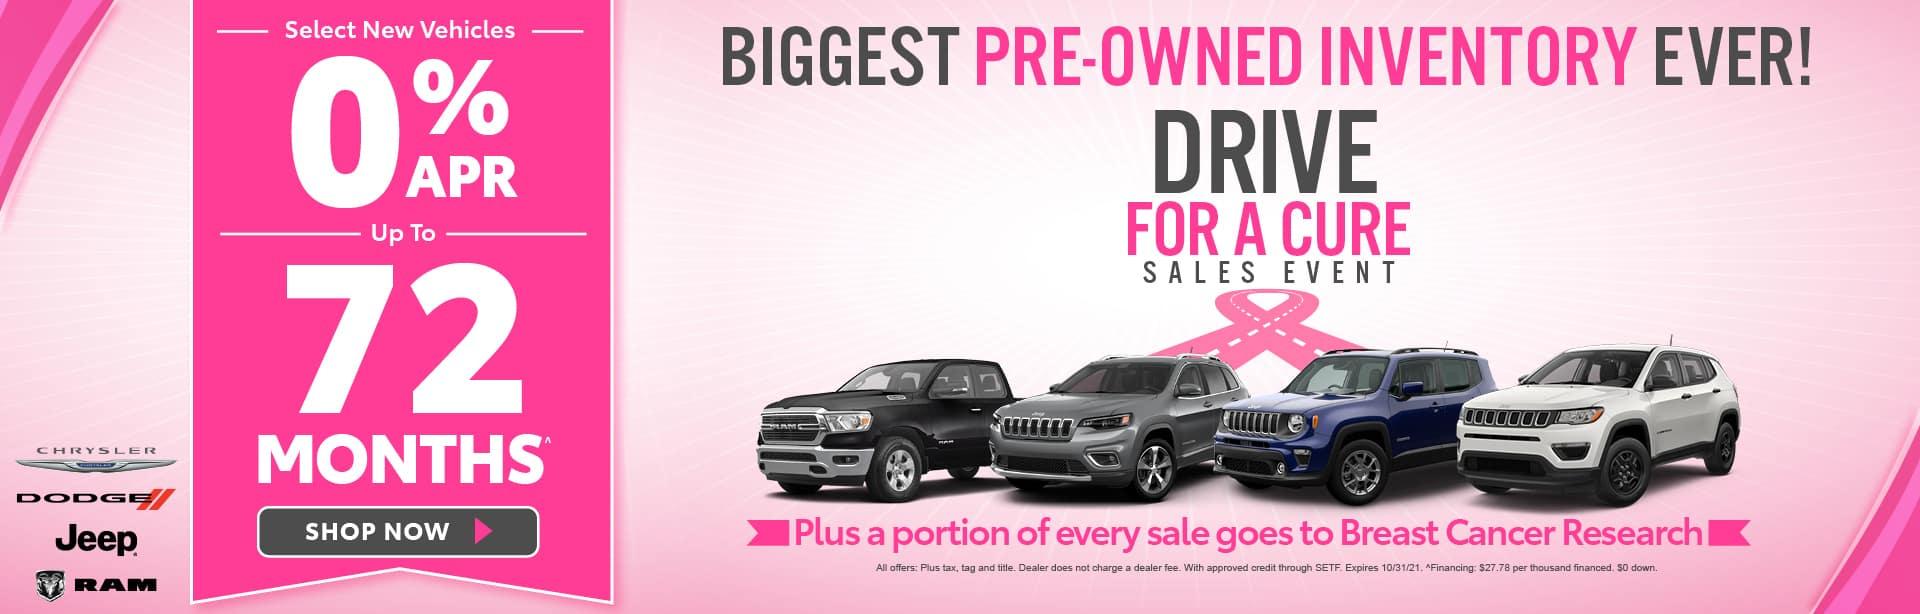 Select New Vehicles 0% APR